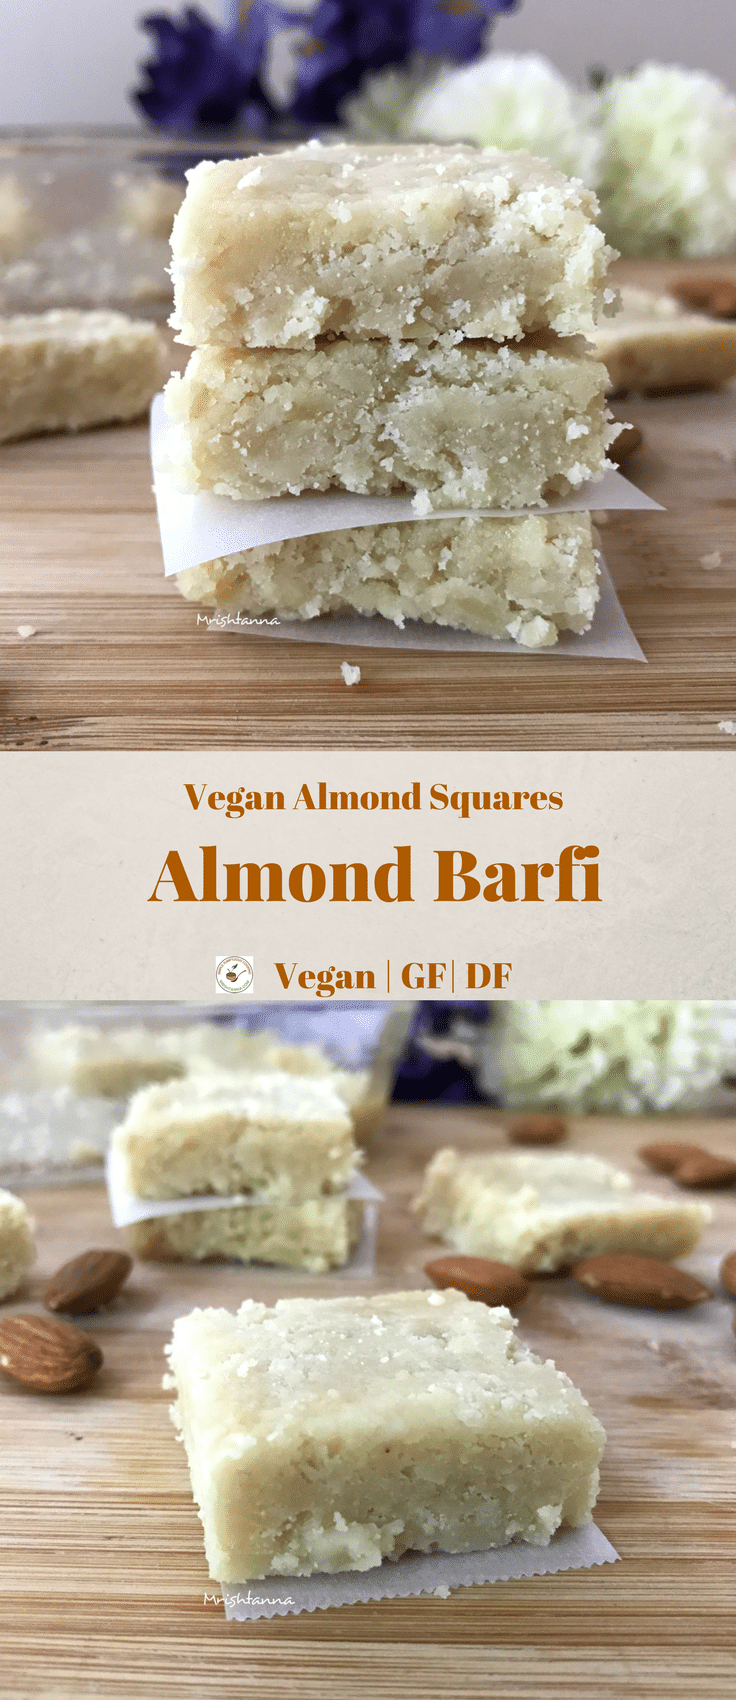 Almond and Barfi